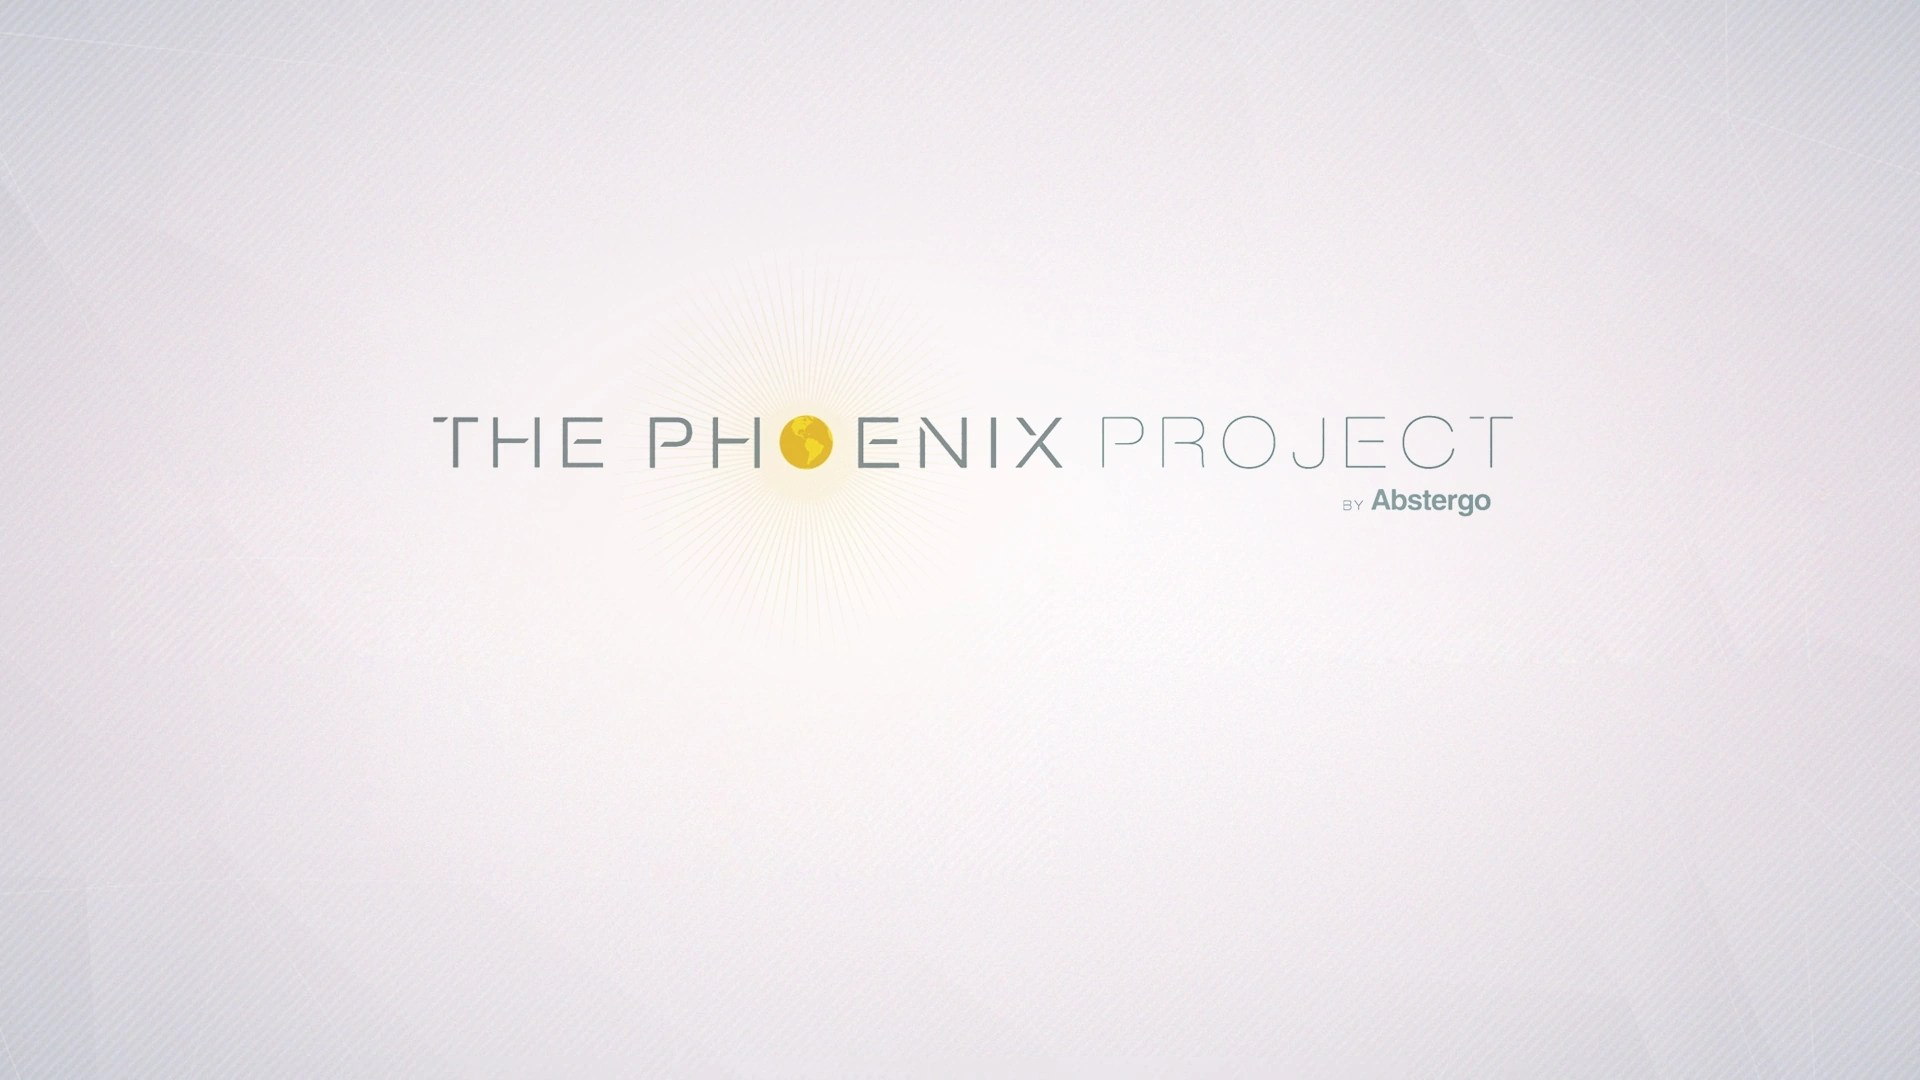 phoenix project logo [ 1920 x 1080 Pixel ]